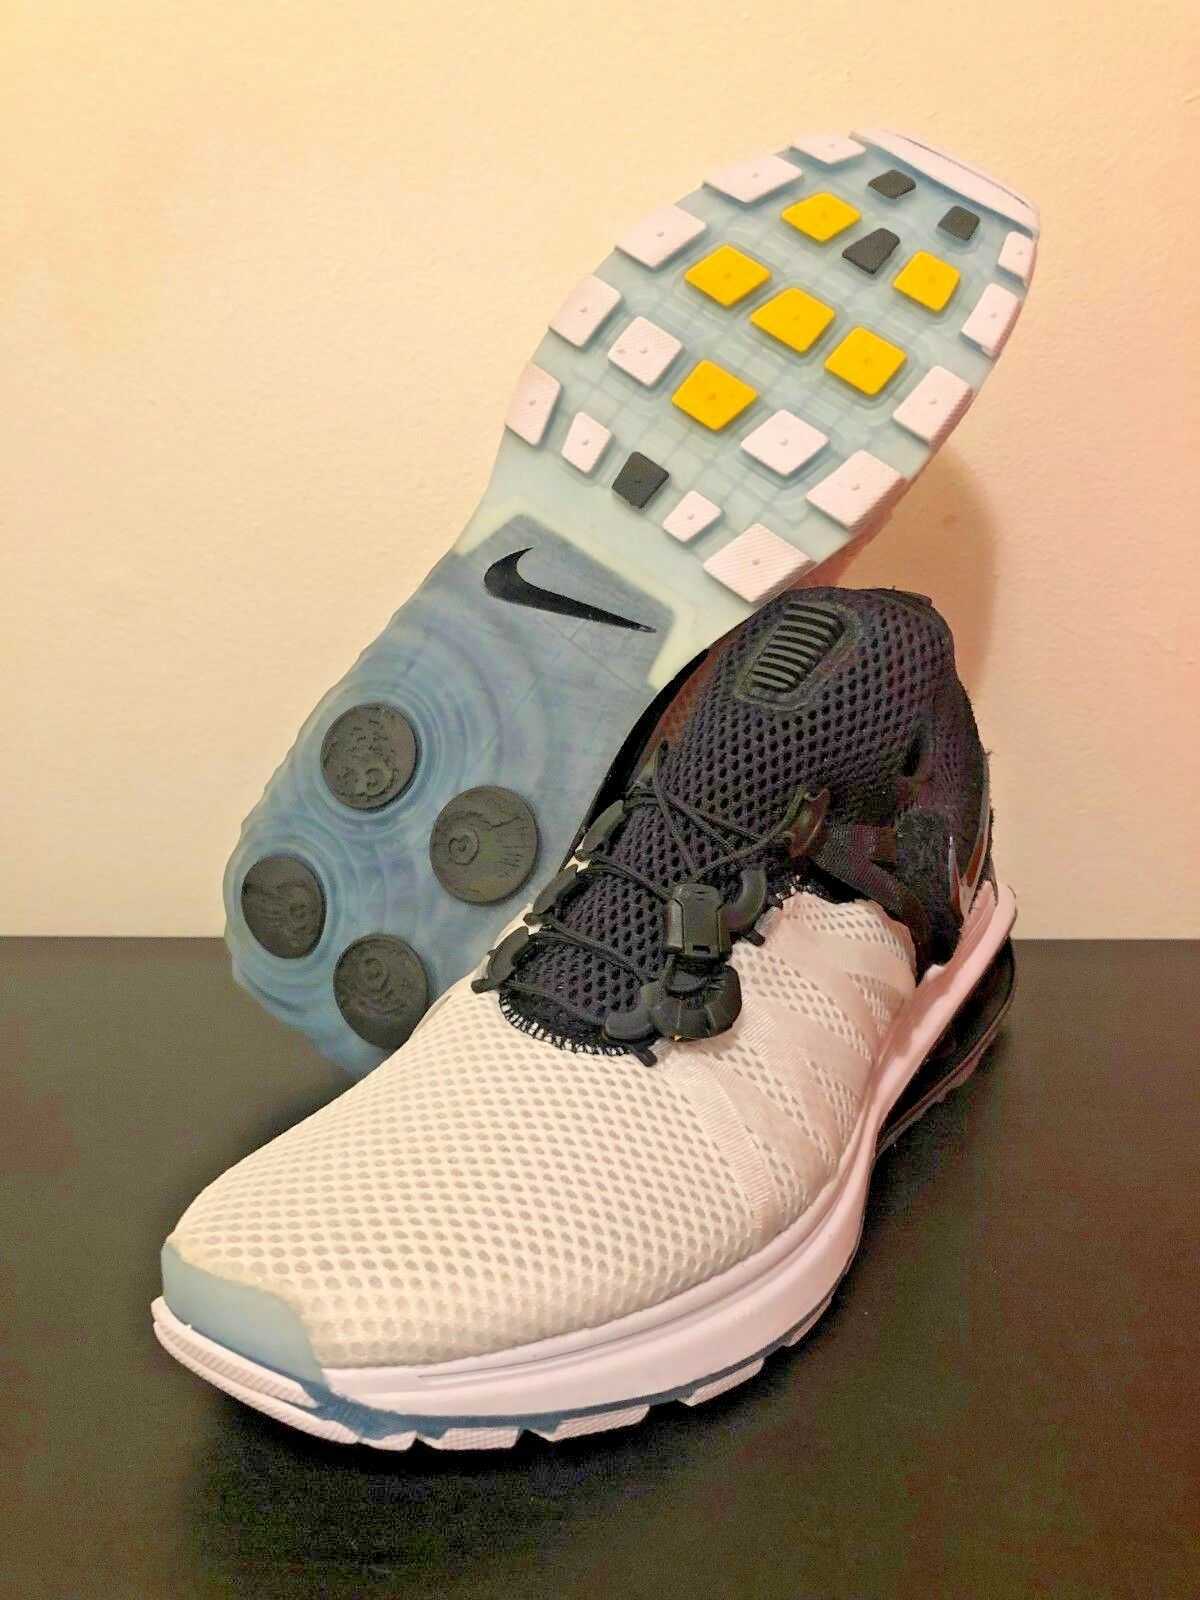 Nike Shox Gravity Running shoes Black White AR1999-101 Men's Size 10.5